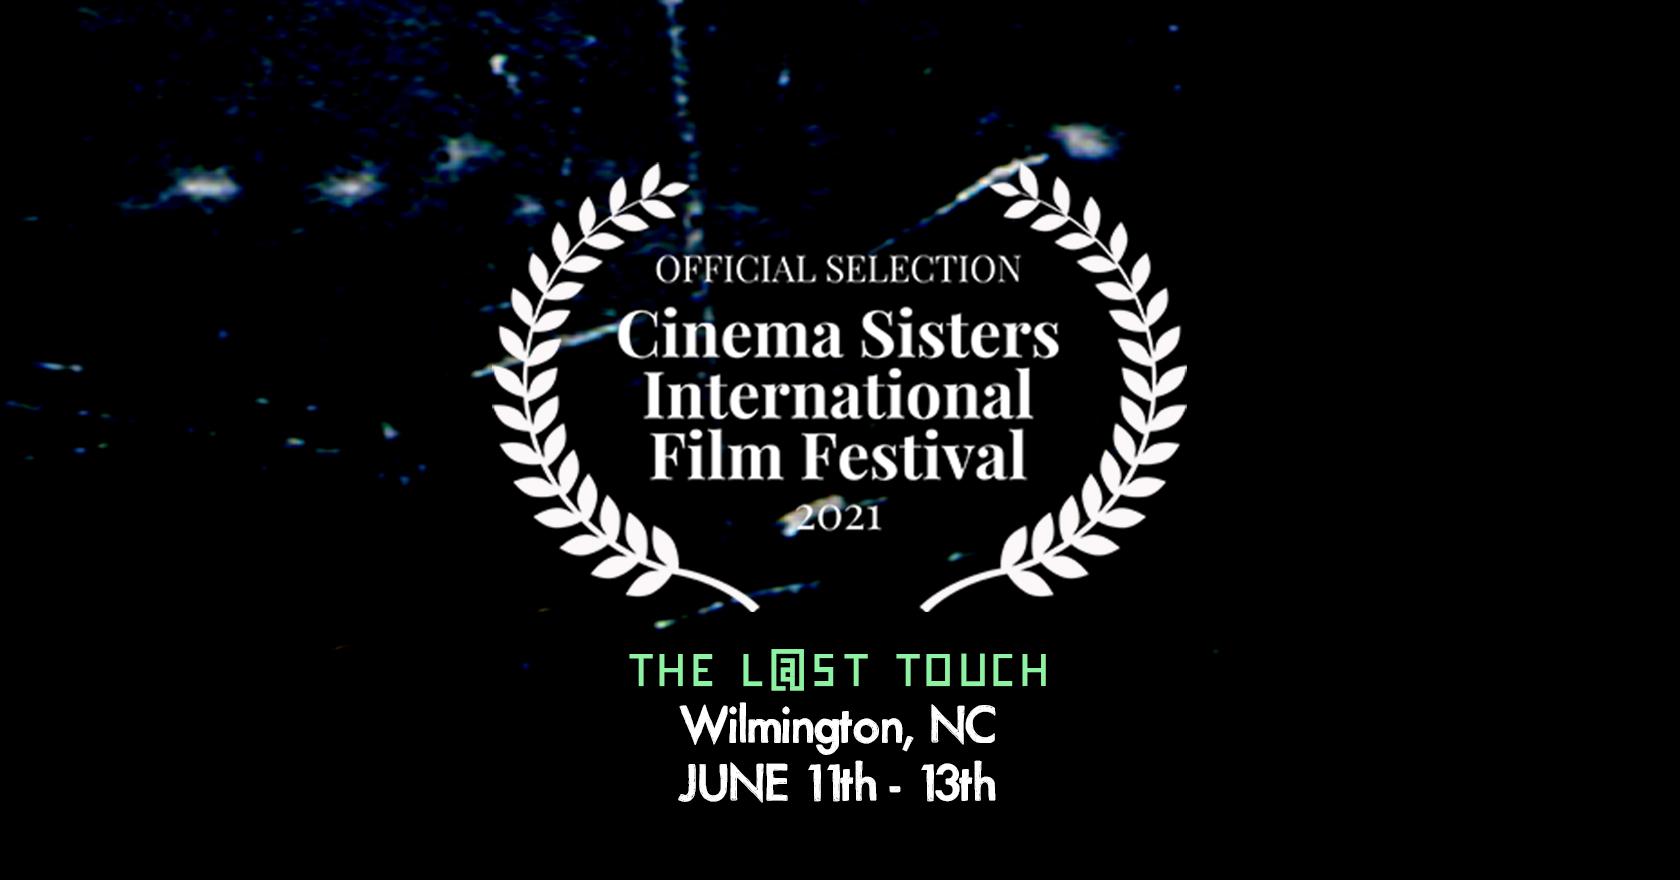 Official Selection at Cinema Sisters International Film Festival 2021 | June 11 – 13